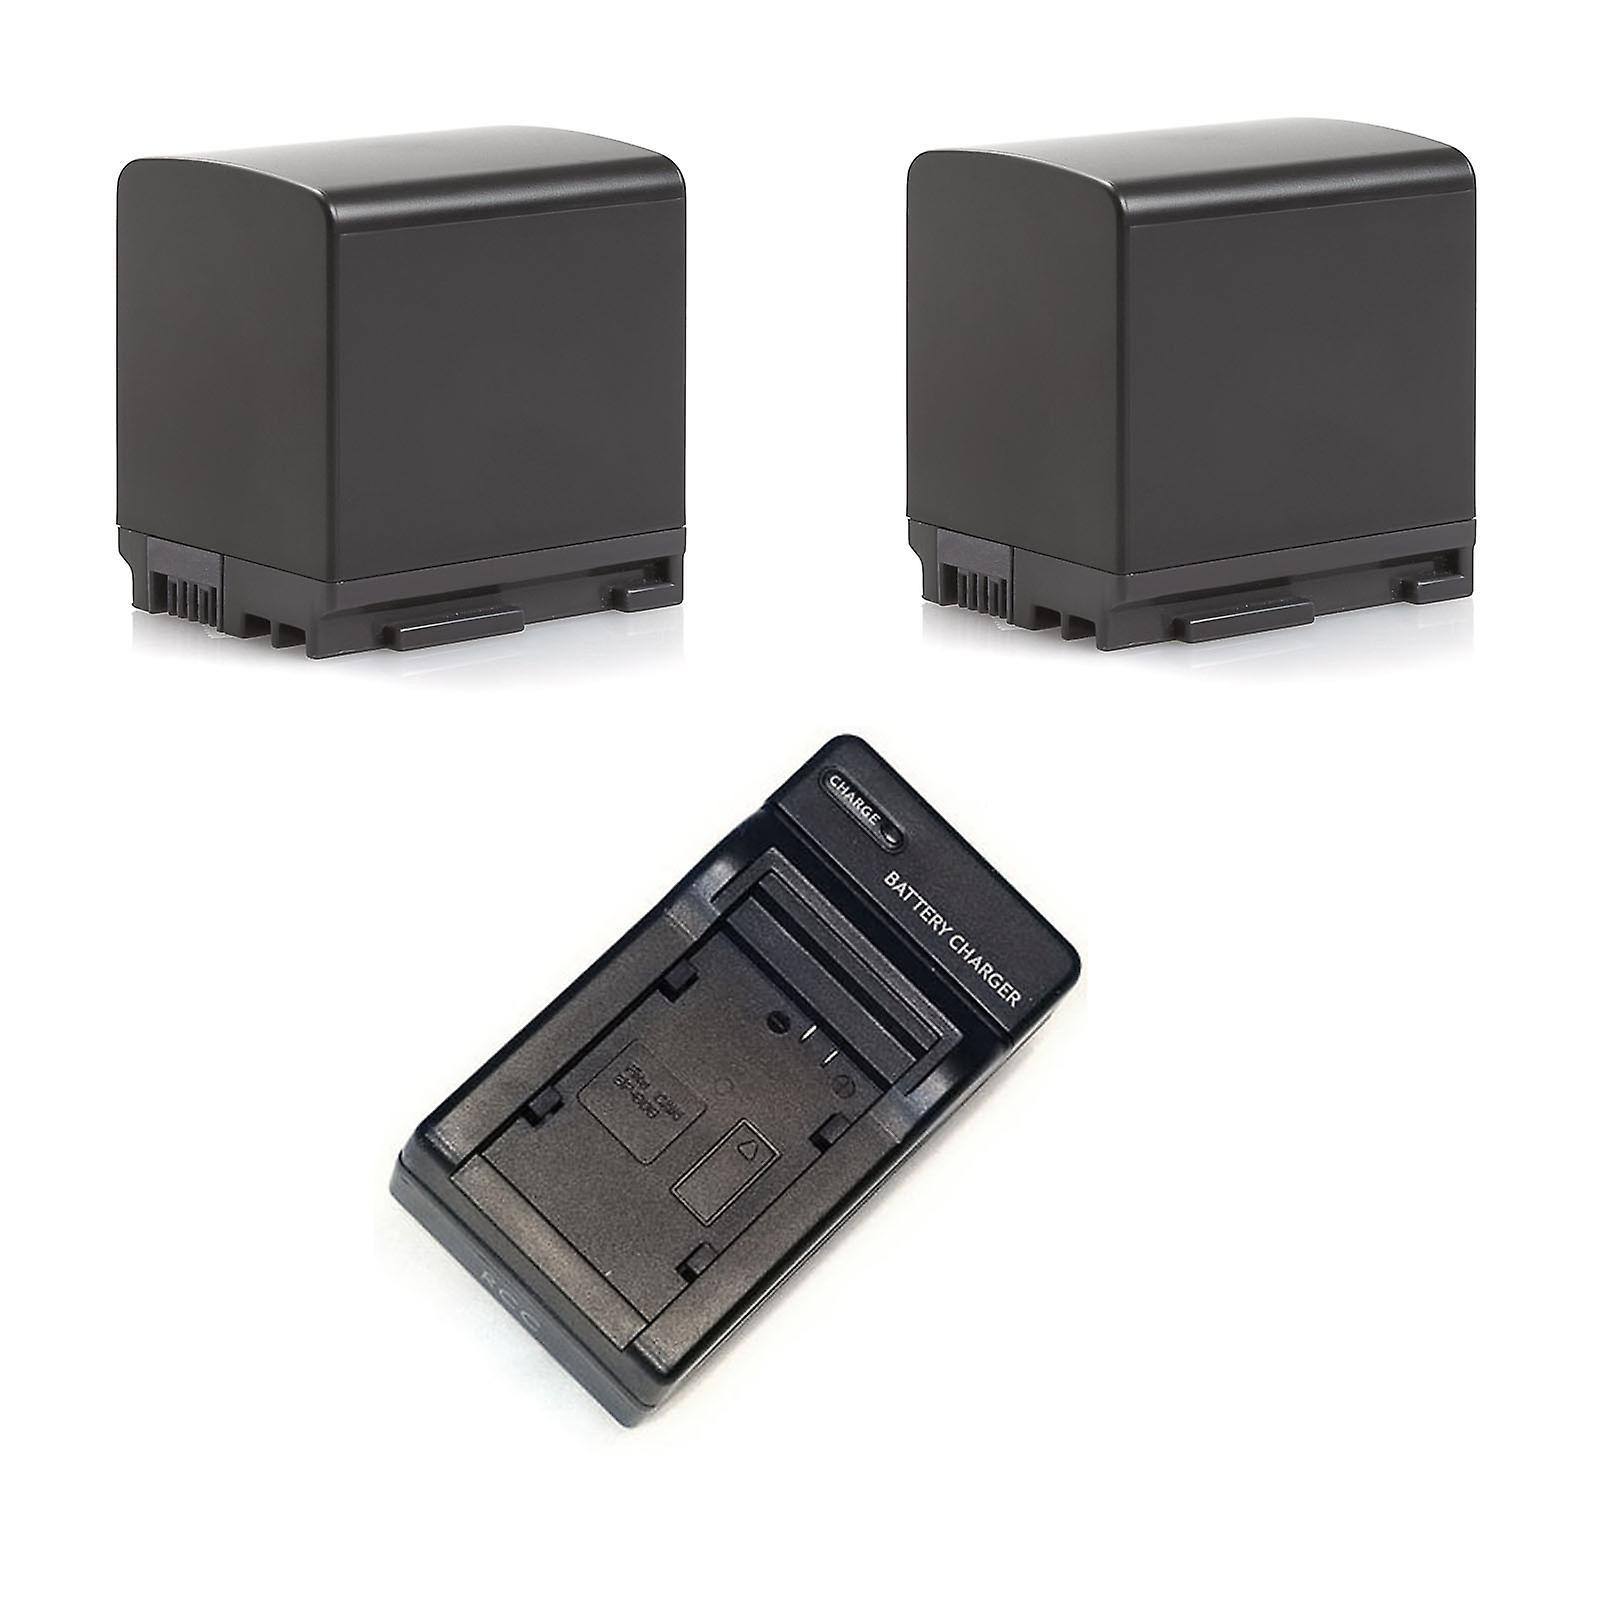 XA20 HF20 HF-G30 HF S11 Ladegerät für Canon iVIS HF S10 HF S21 XA25